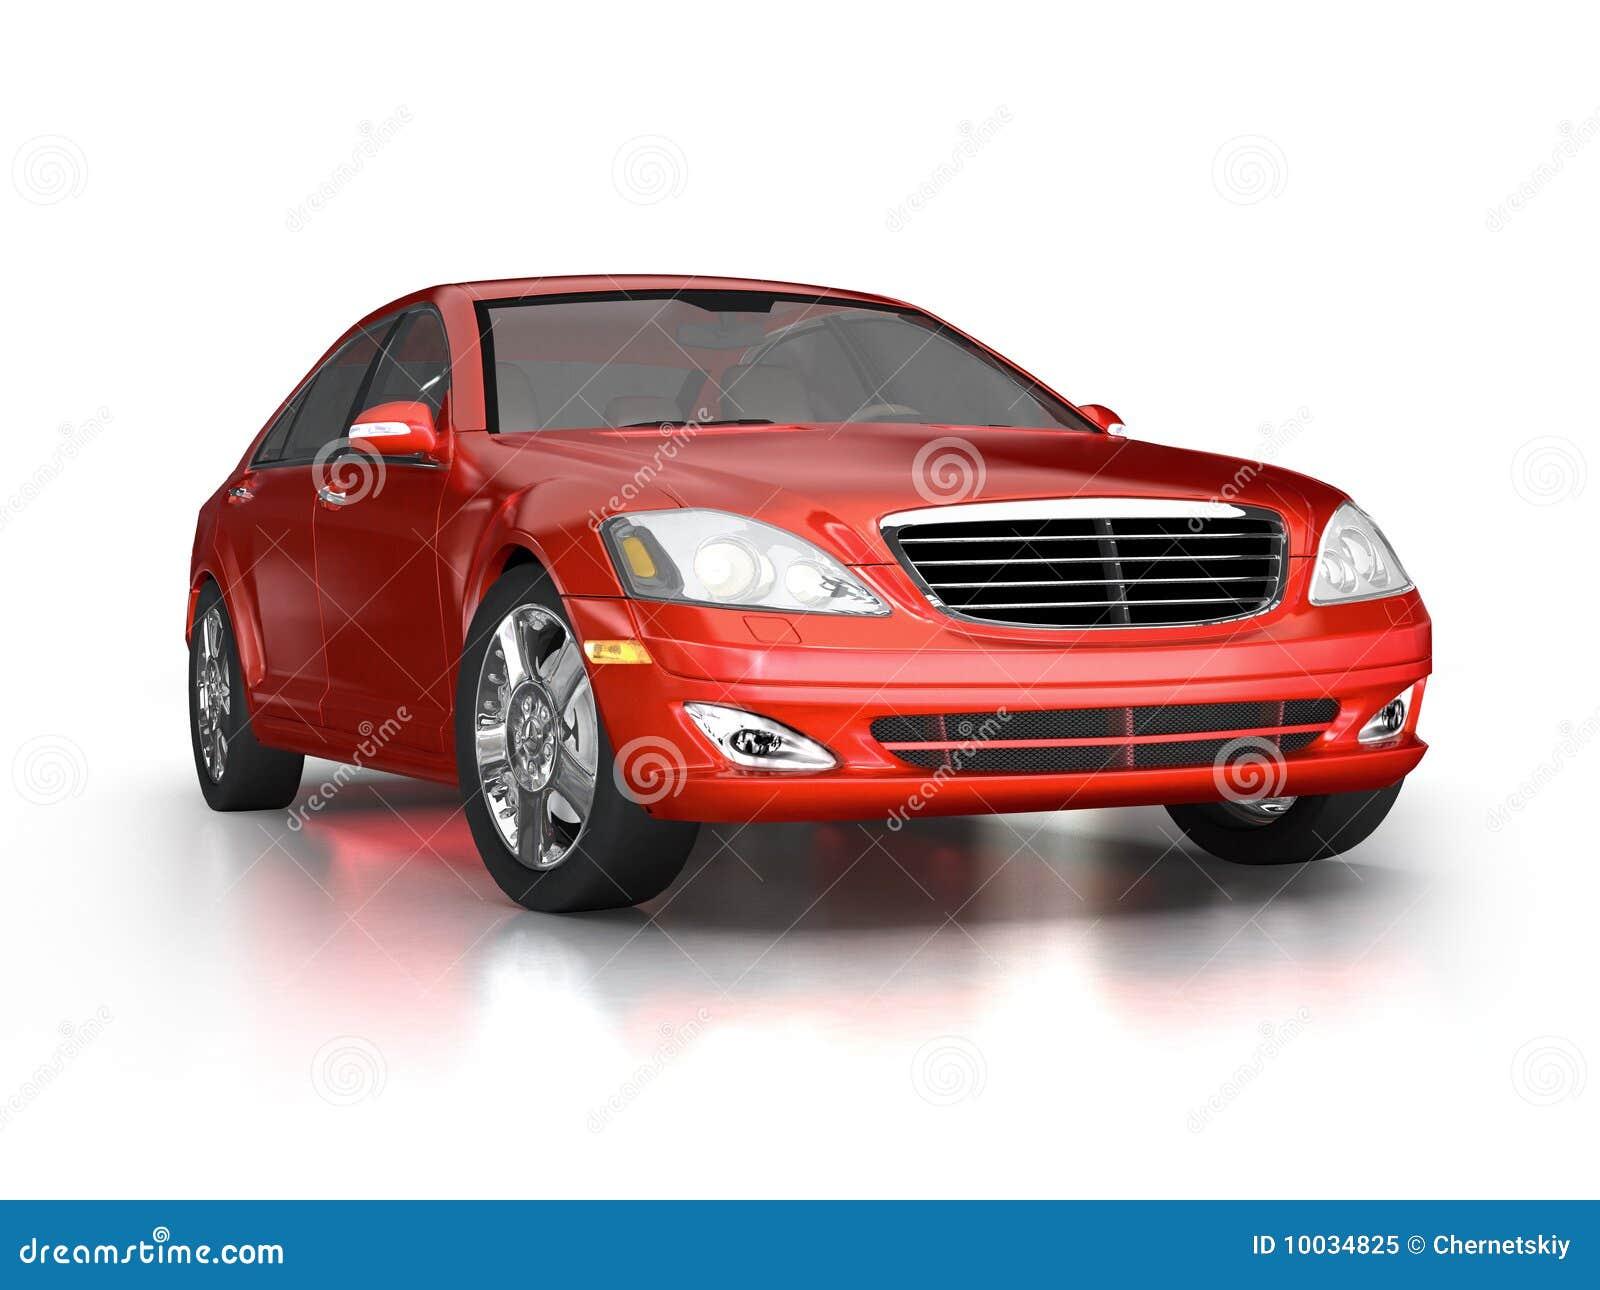 large luxury red car stock illustration image of concept. Black Bedroom Furniture Sets. Home Design Ideas